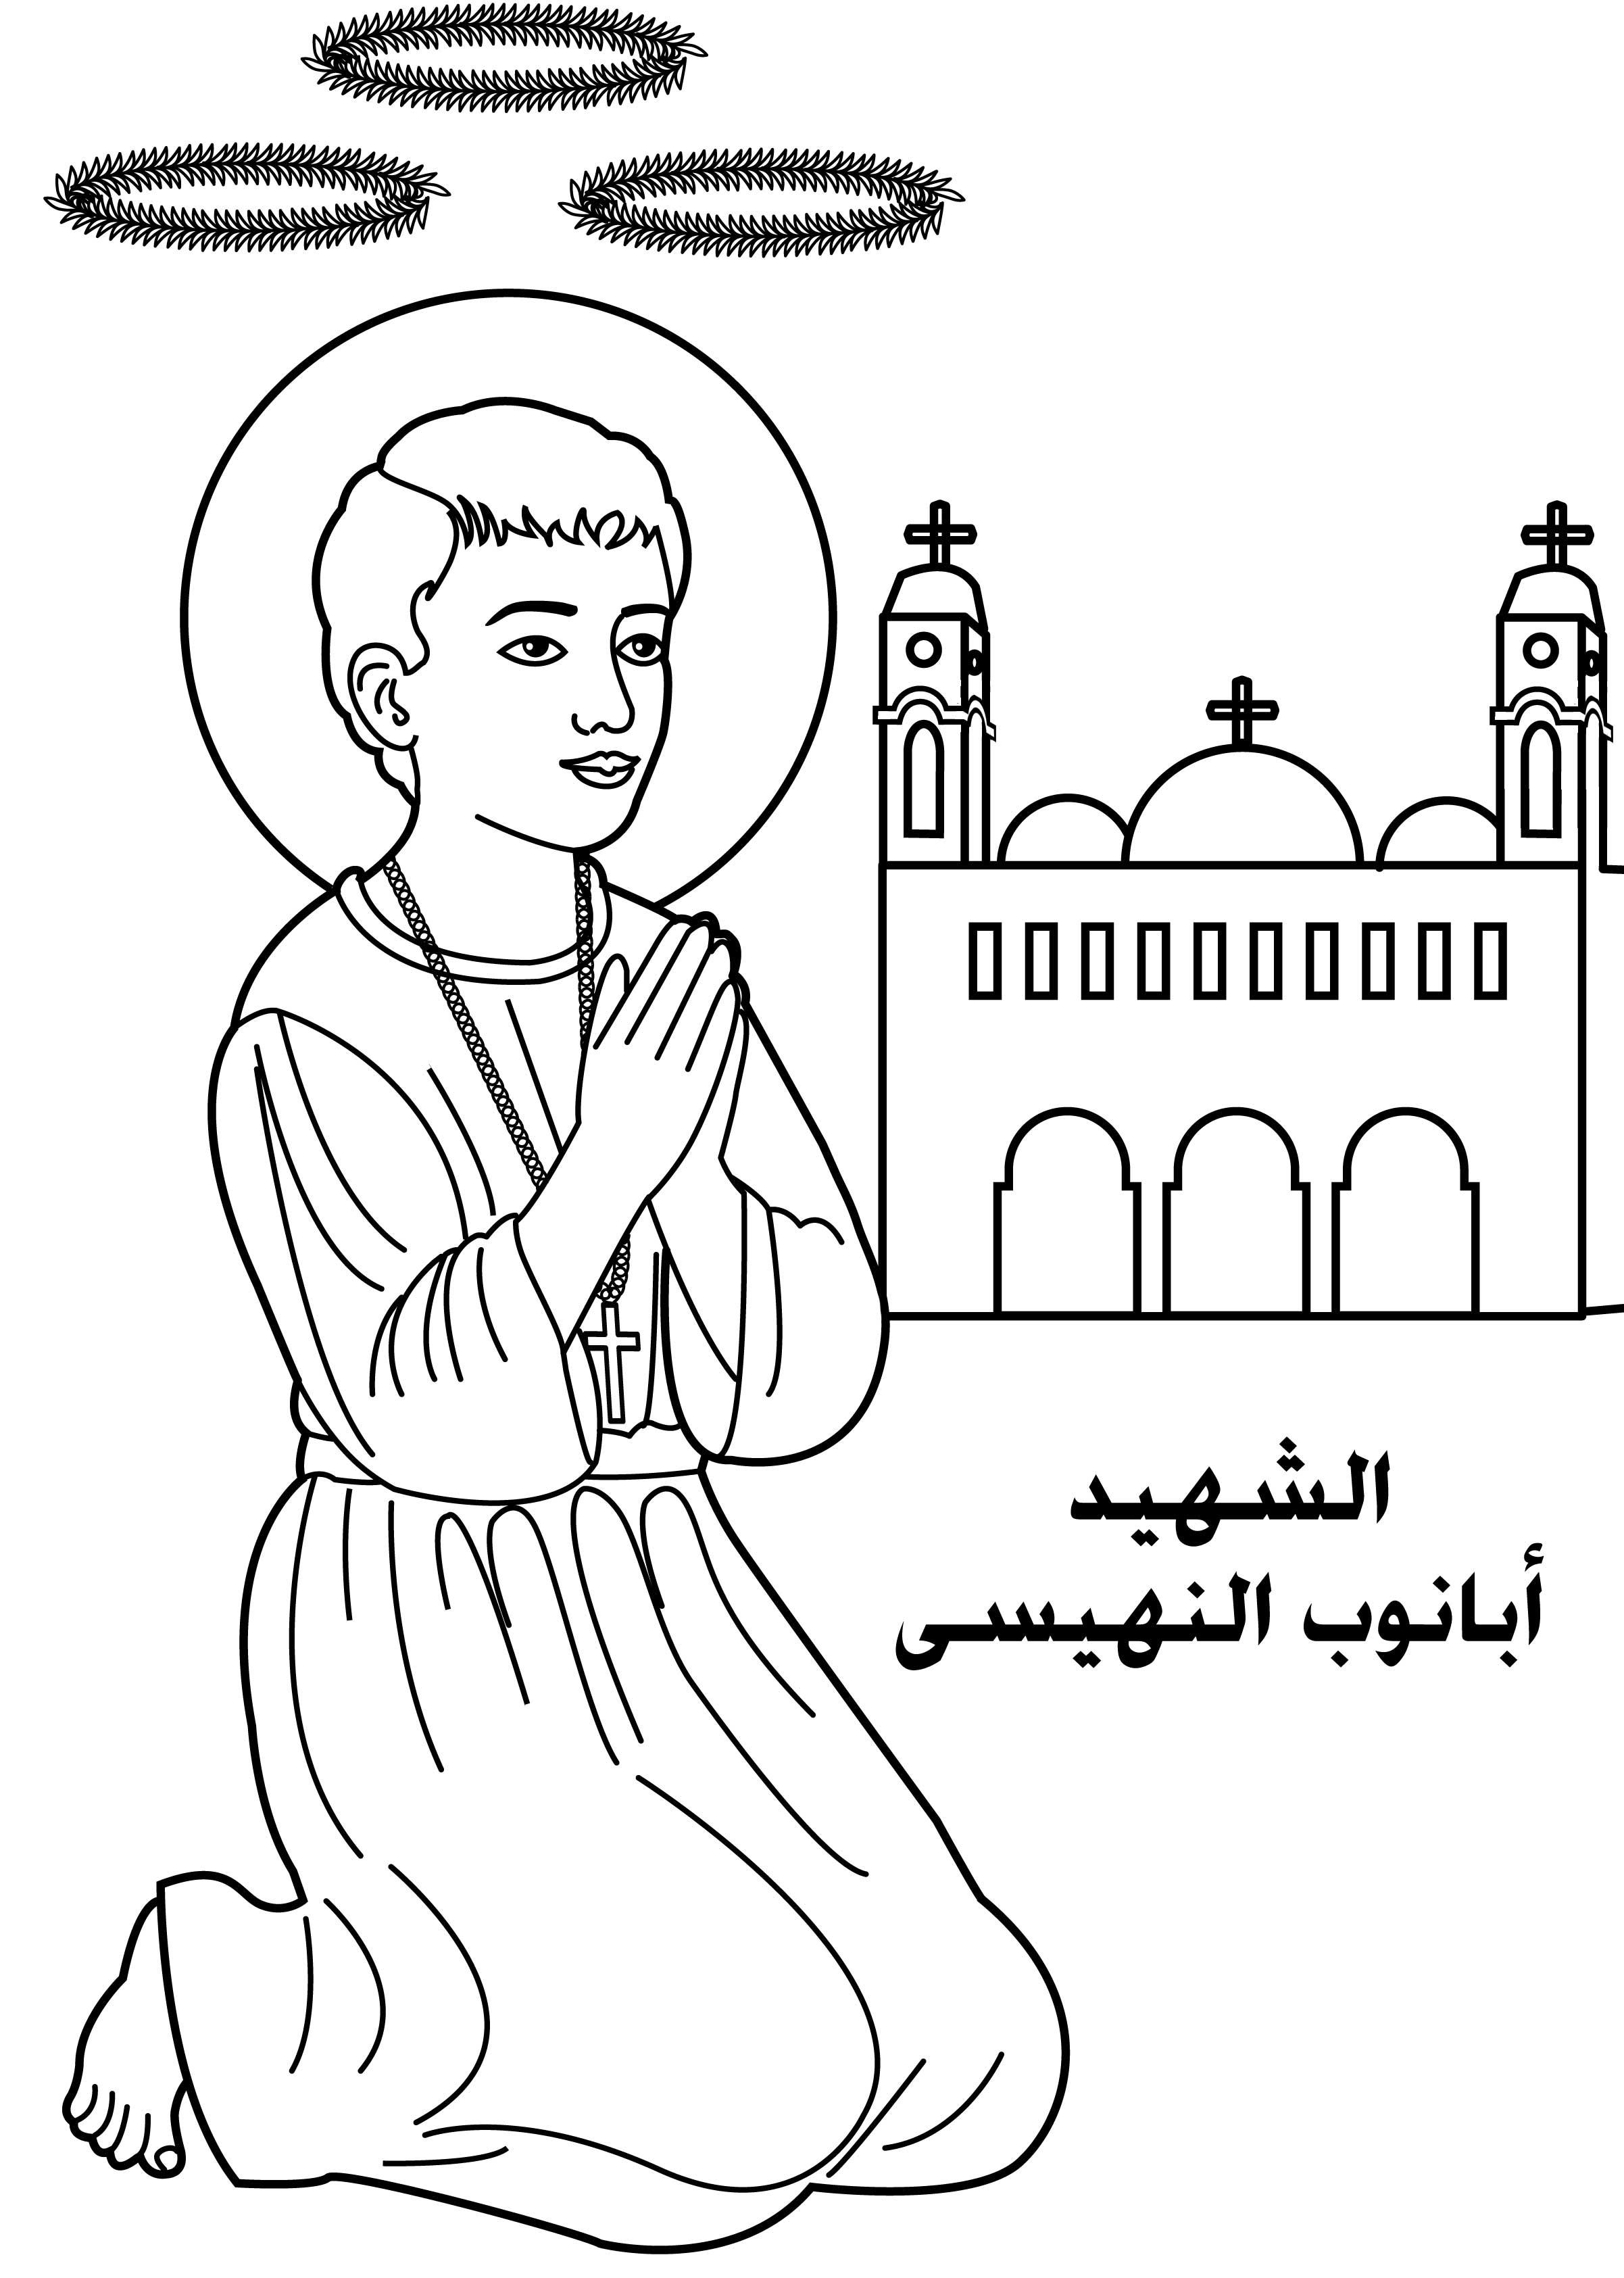 Image Coloring St Abanoub صورة تلوين الشهيد أبانوب النهيسى